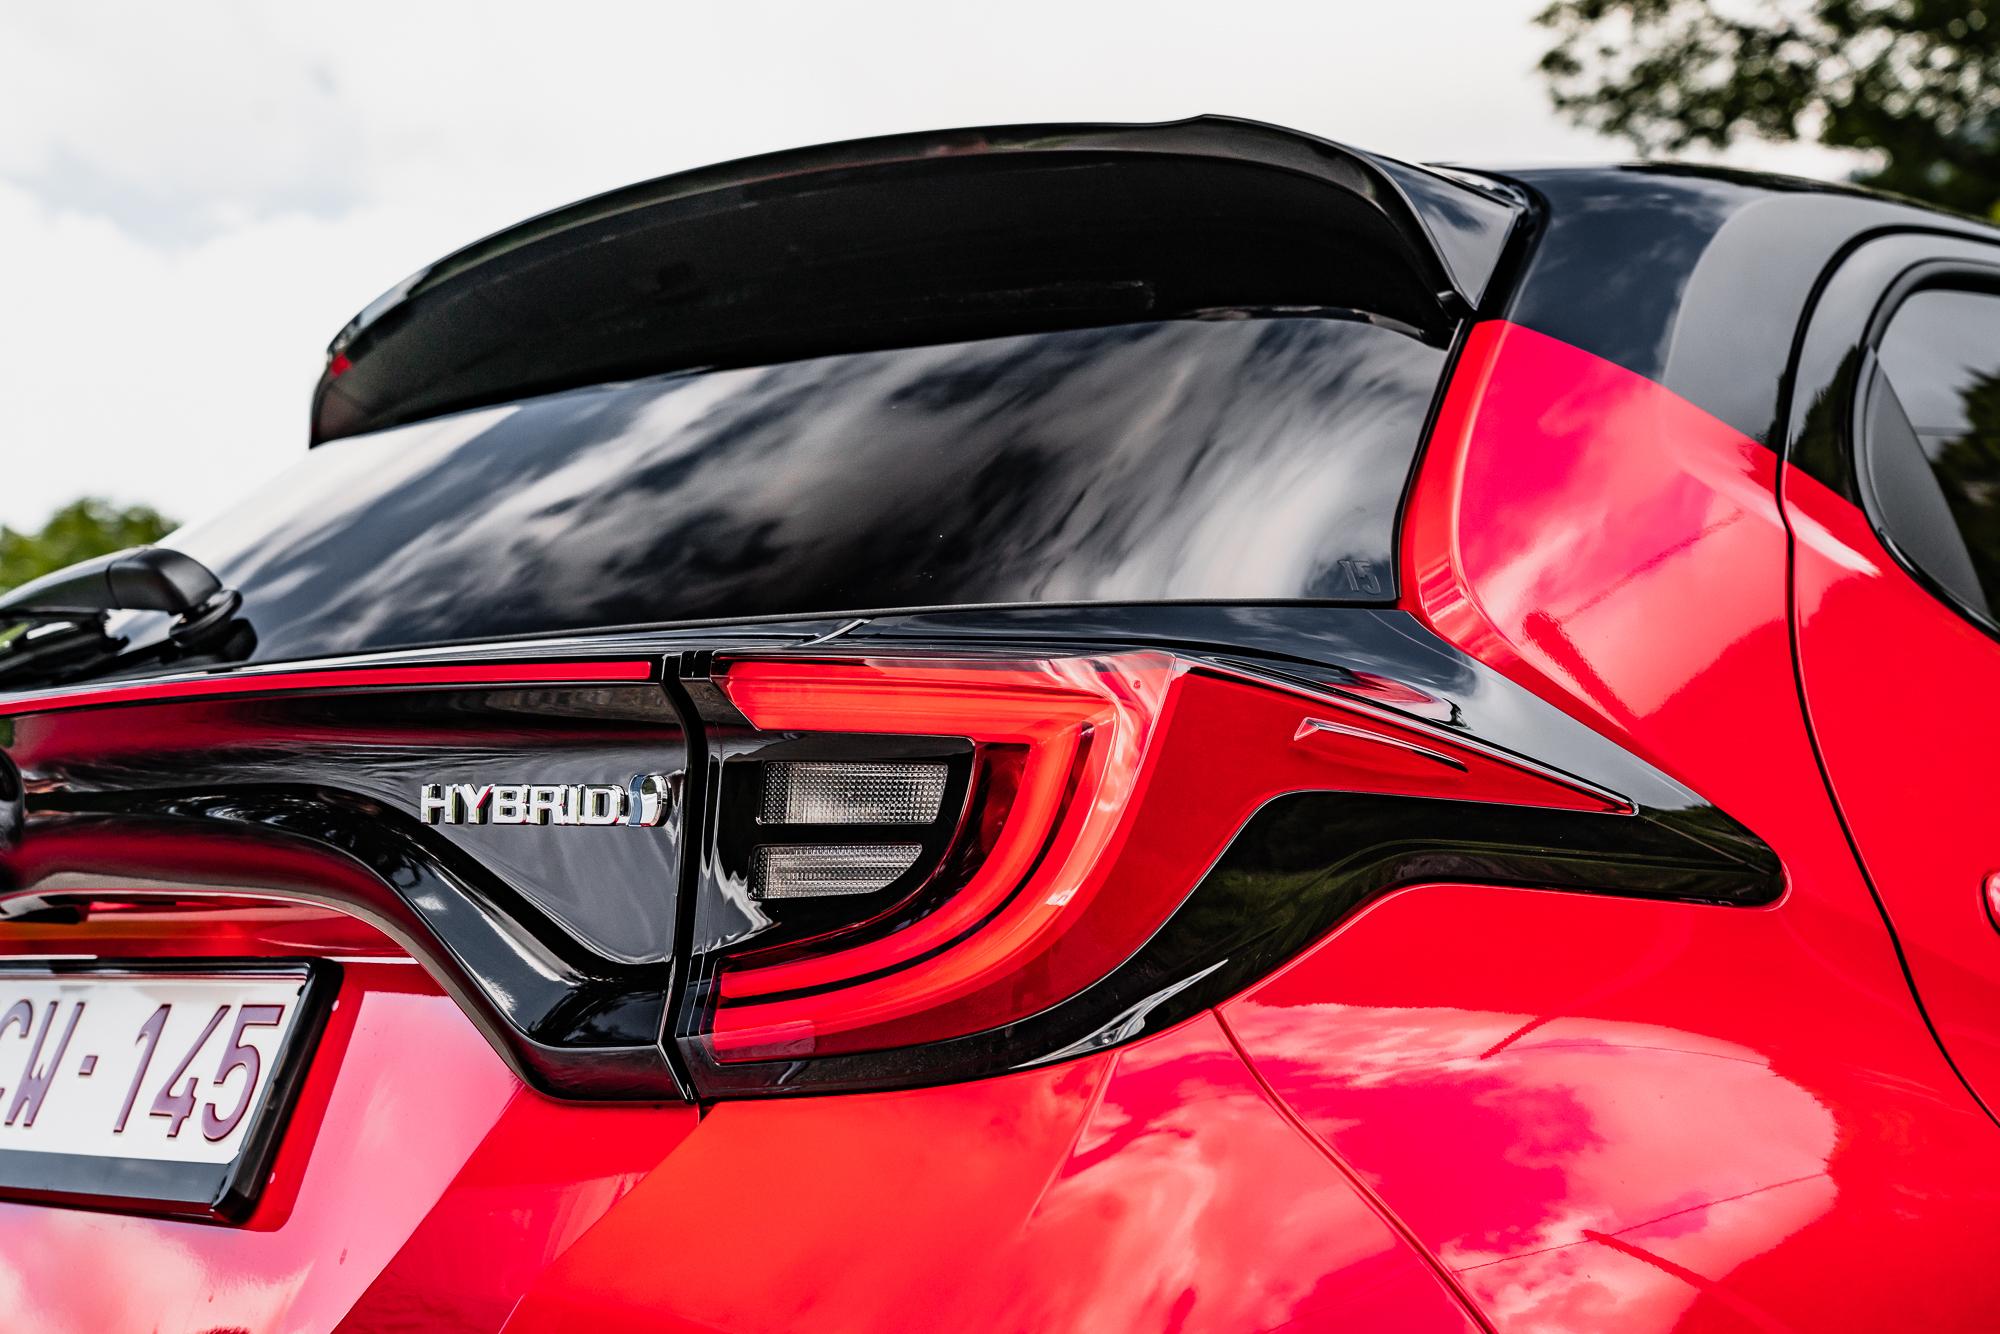 voiture hybride, Toyota, Yaris, citadine, testdrive